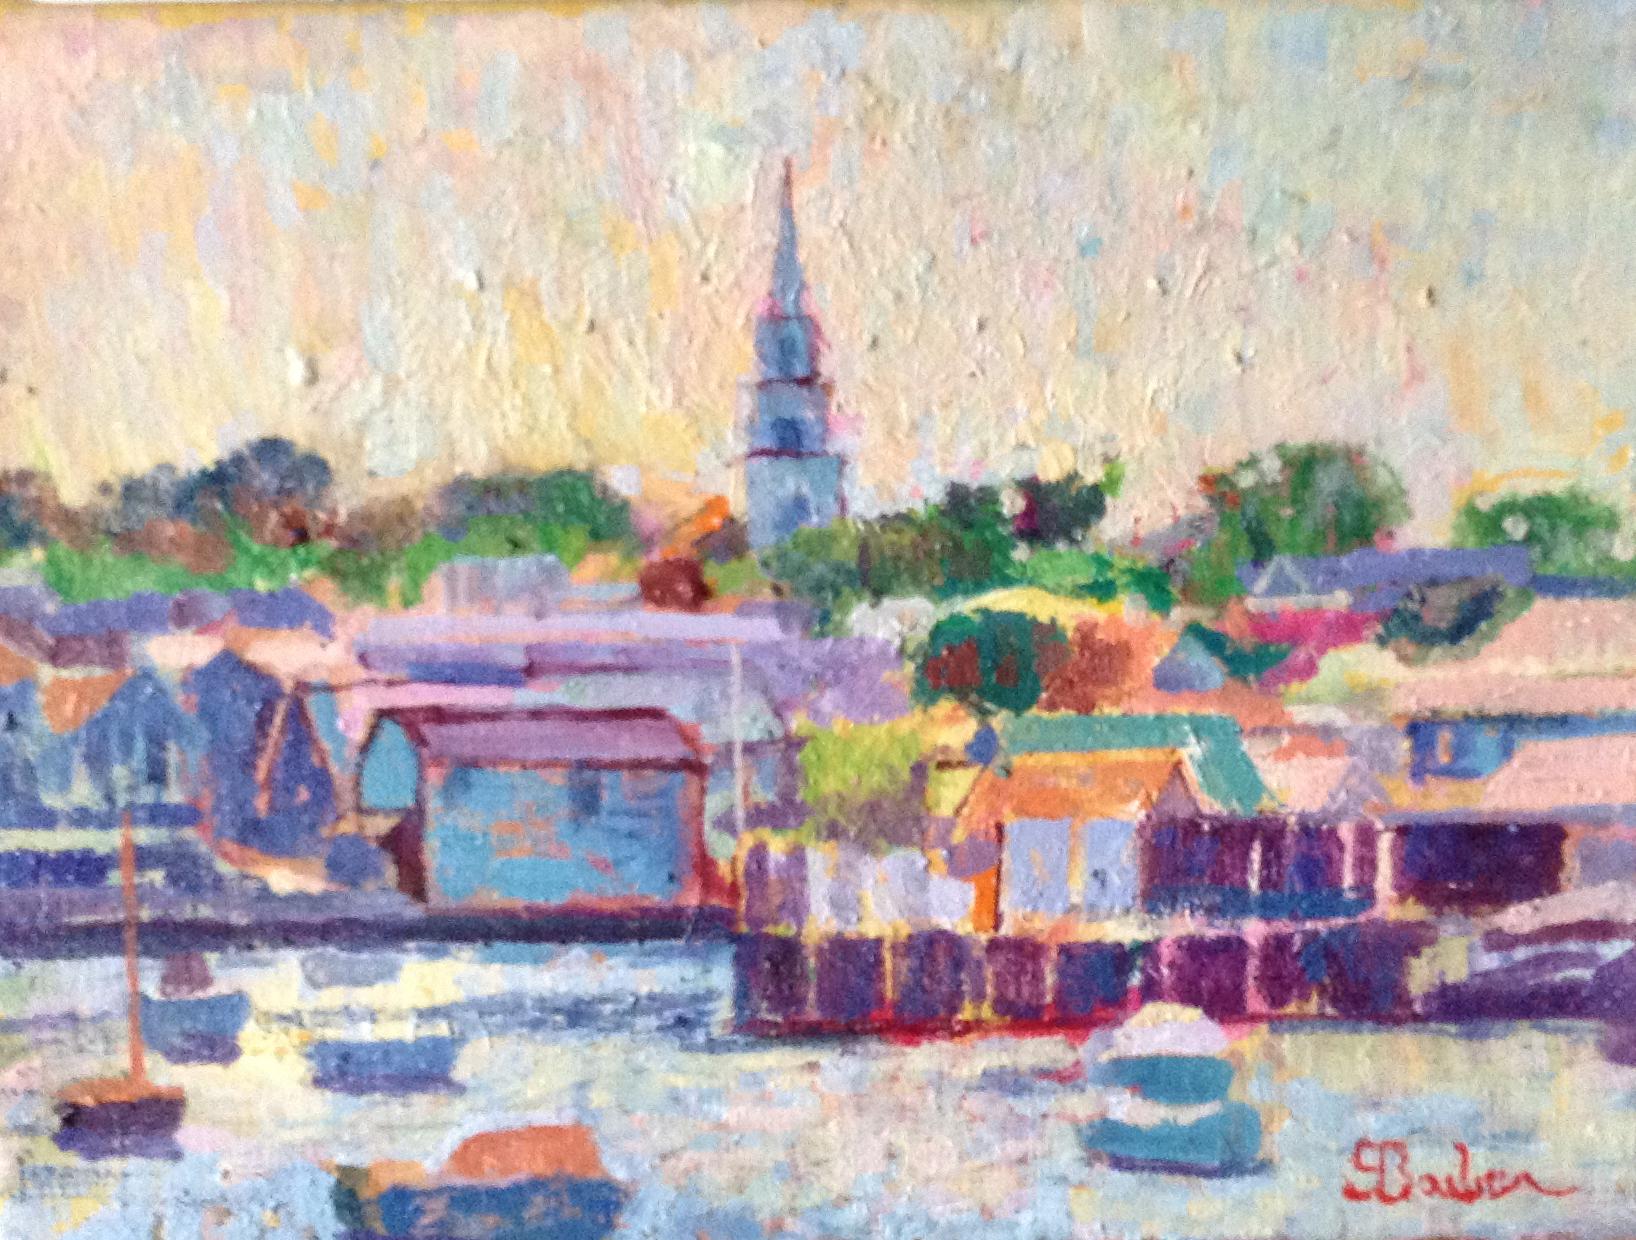 Nantucket Harbor  | 9 x 12  | Oil on canvas